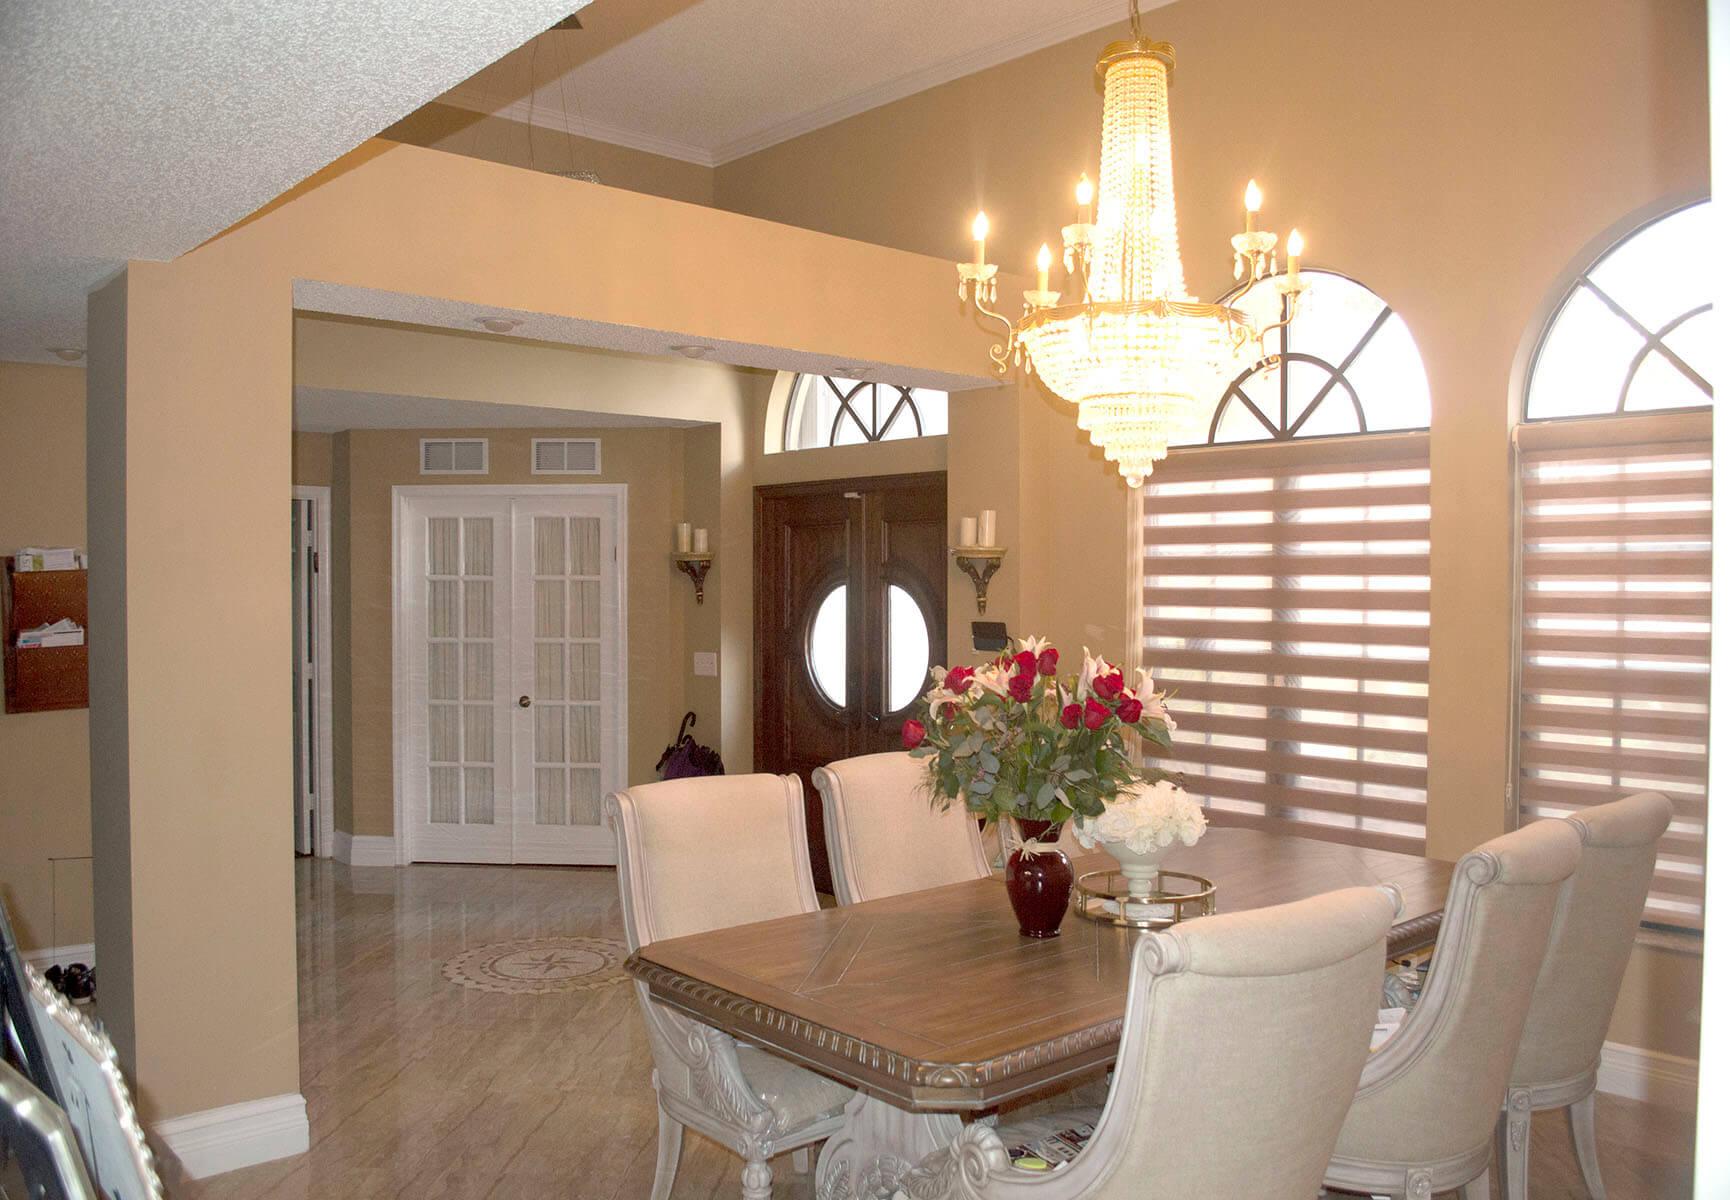 9651-Ridgeside-Ct-Davie-FL-5-Dining-Room-1